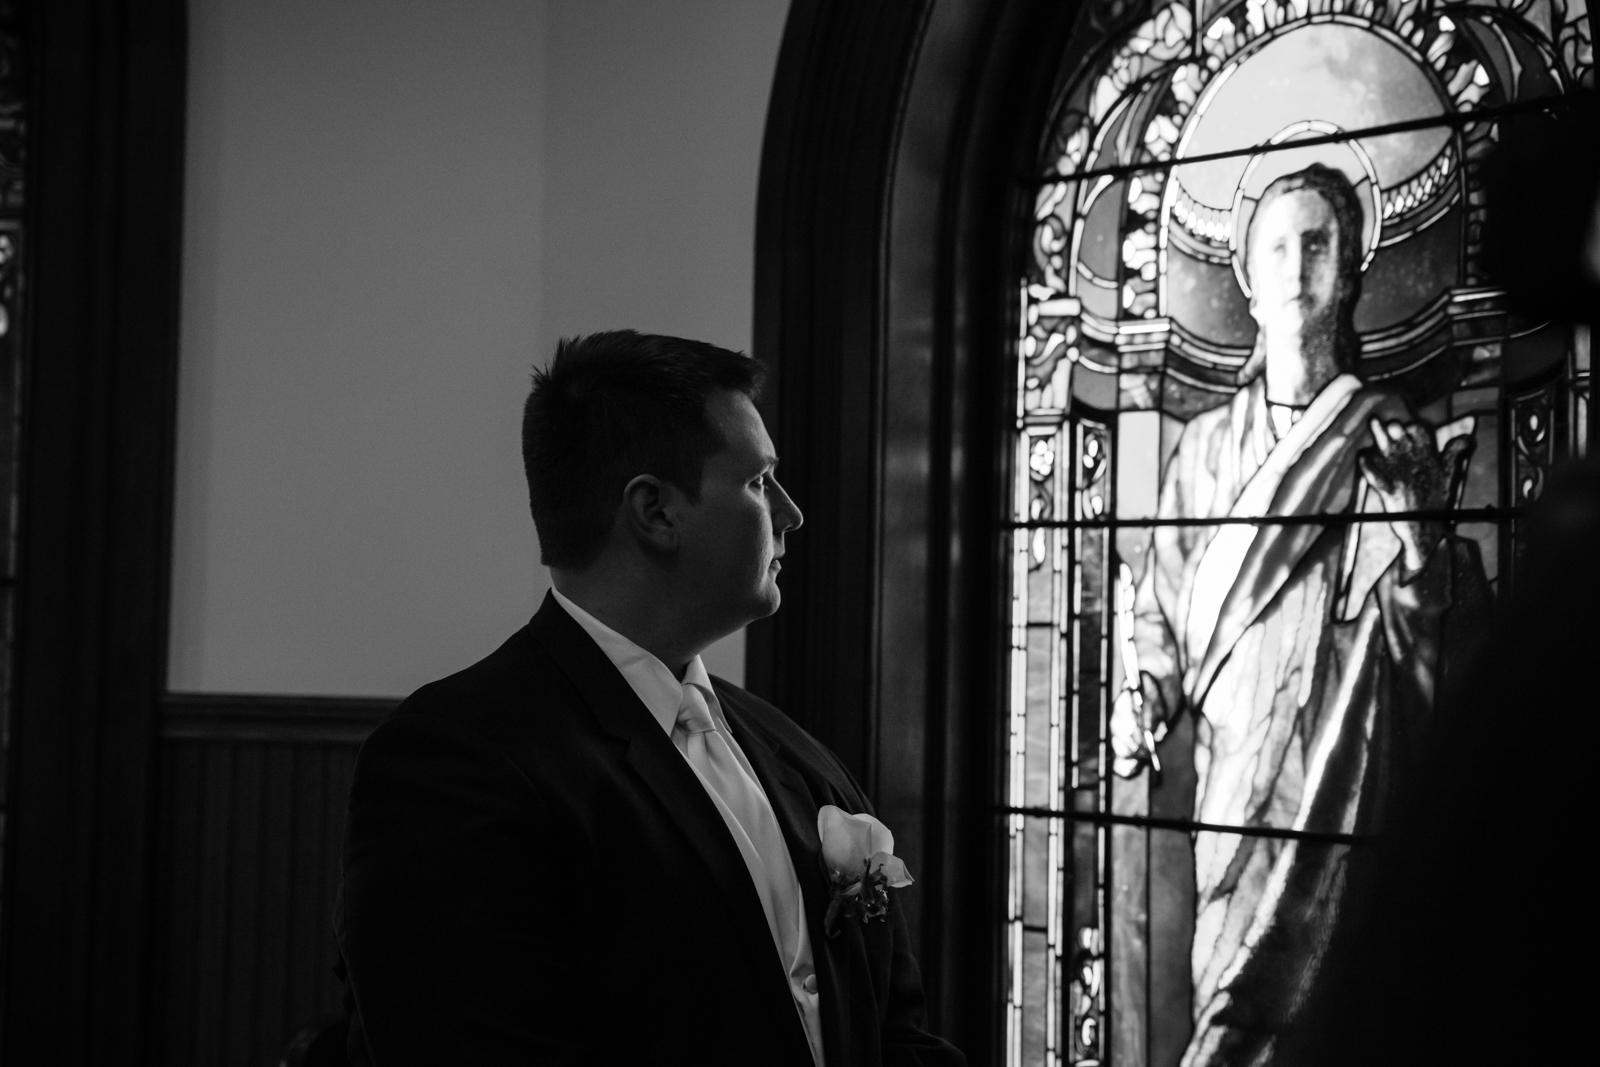 Eastons-Beach-Rotunda-Ballroom-Wedding-Newport-Rhode-Island-PhotographybyAmandaMorgan-48.jpg